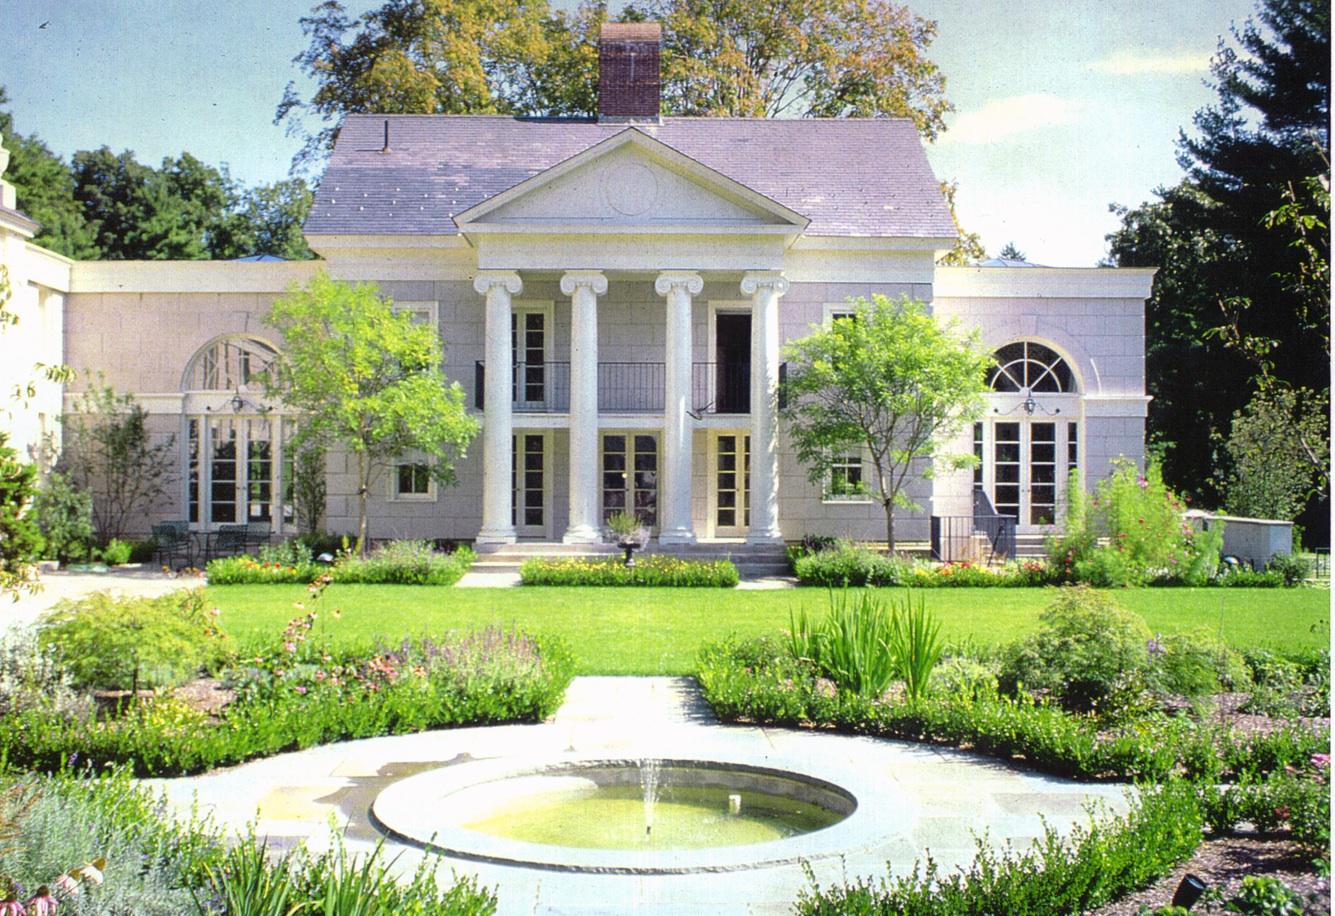 Lyme.Connecticut.Taylor_House.House_&_Garden.Robert_Orr_&_Associates.Architecture.Landscape_Architecture.New_Urbanism.Rear_Garden_Fountain.jpg